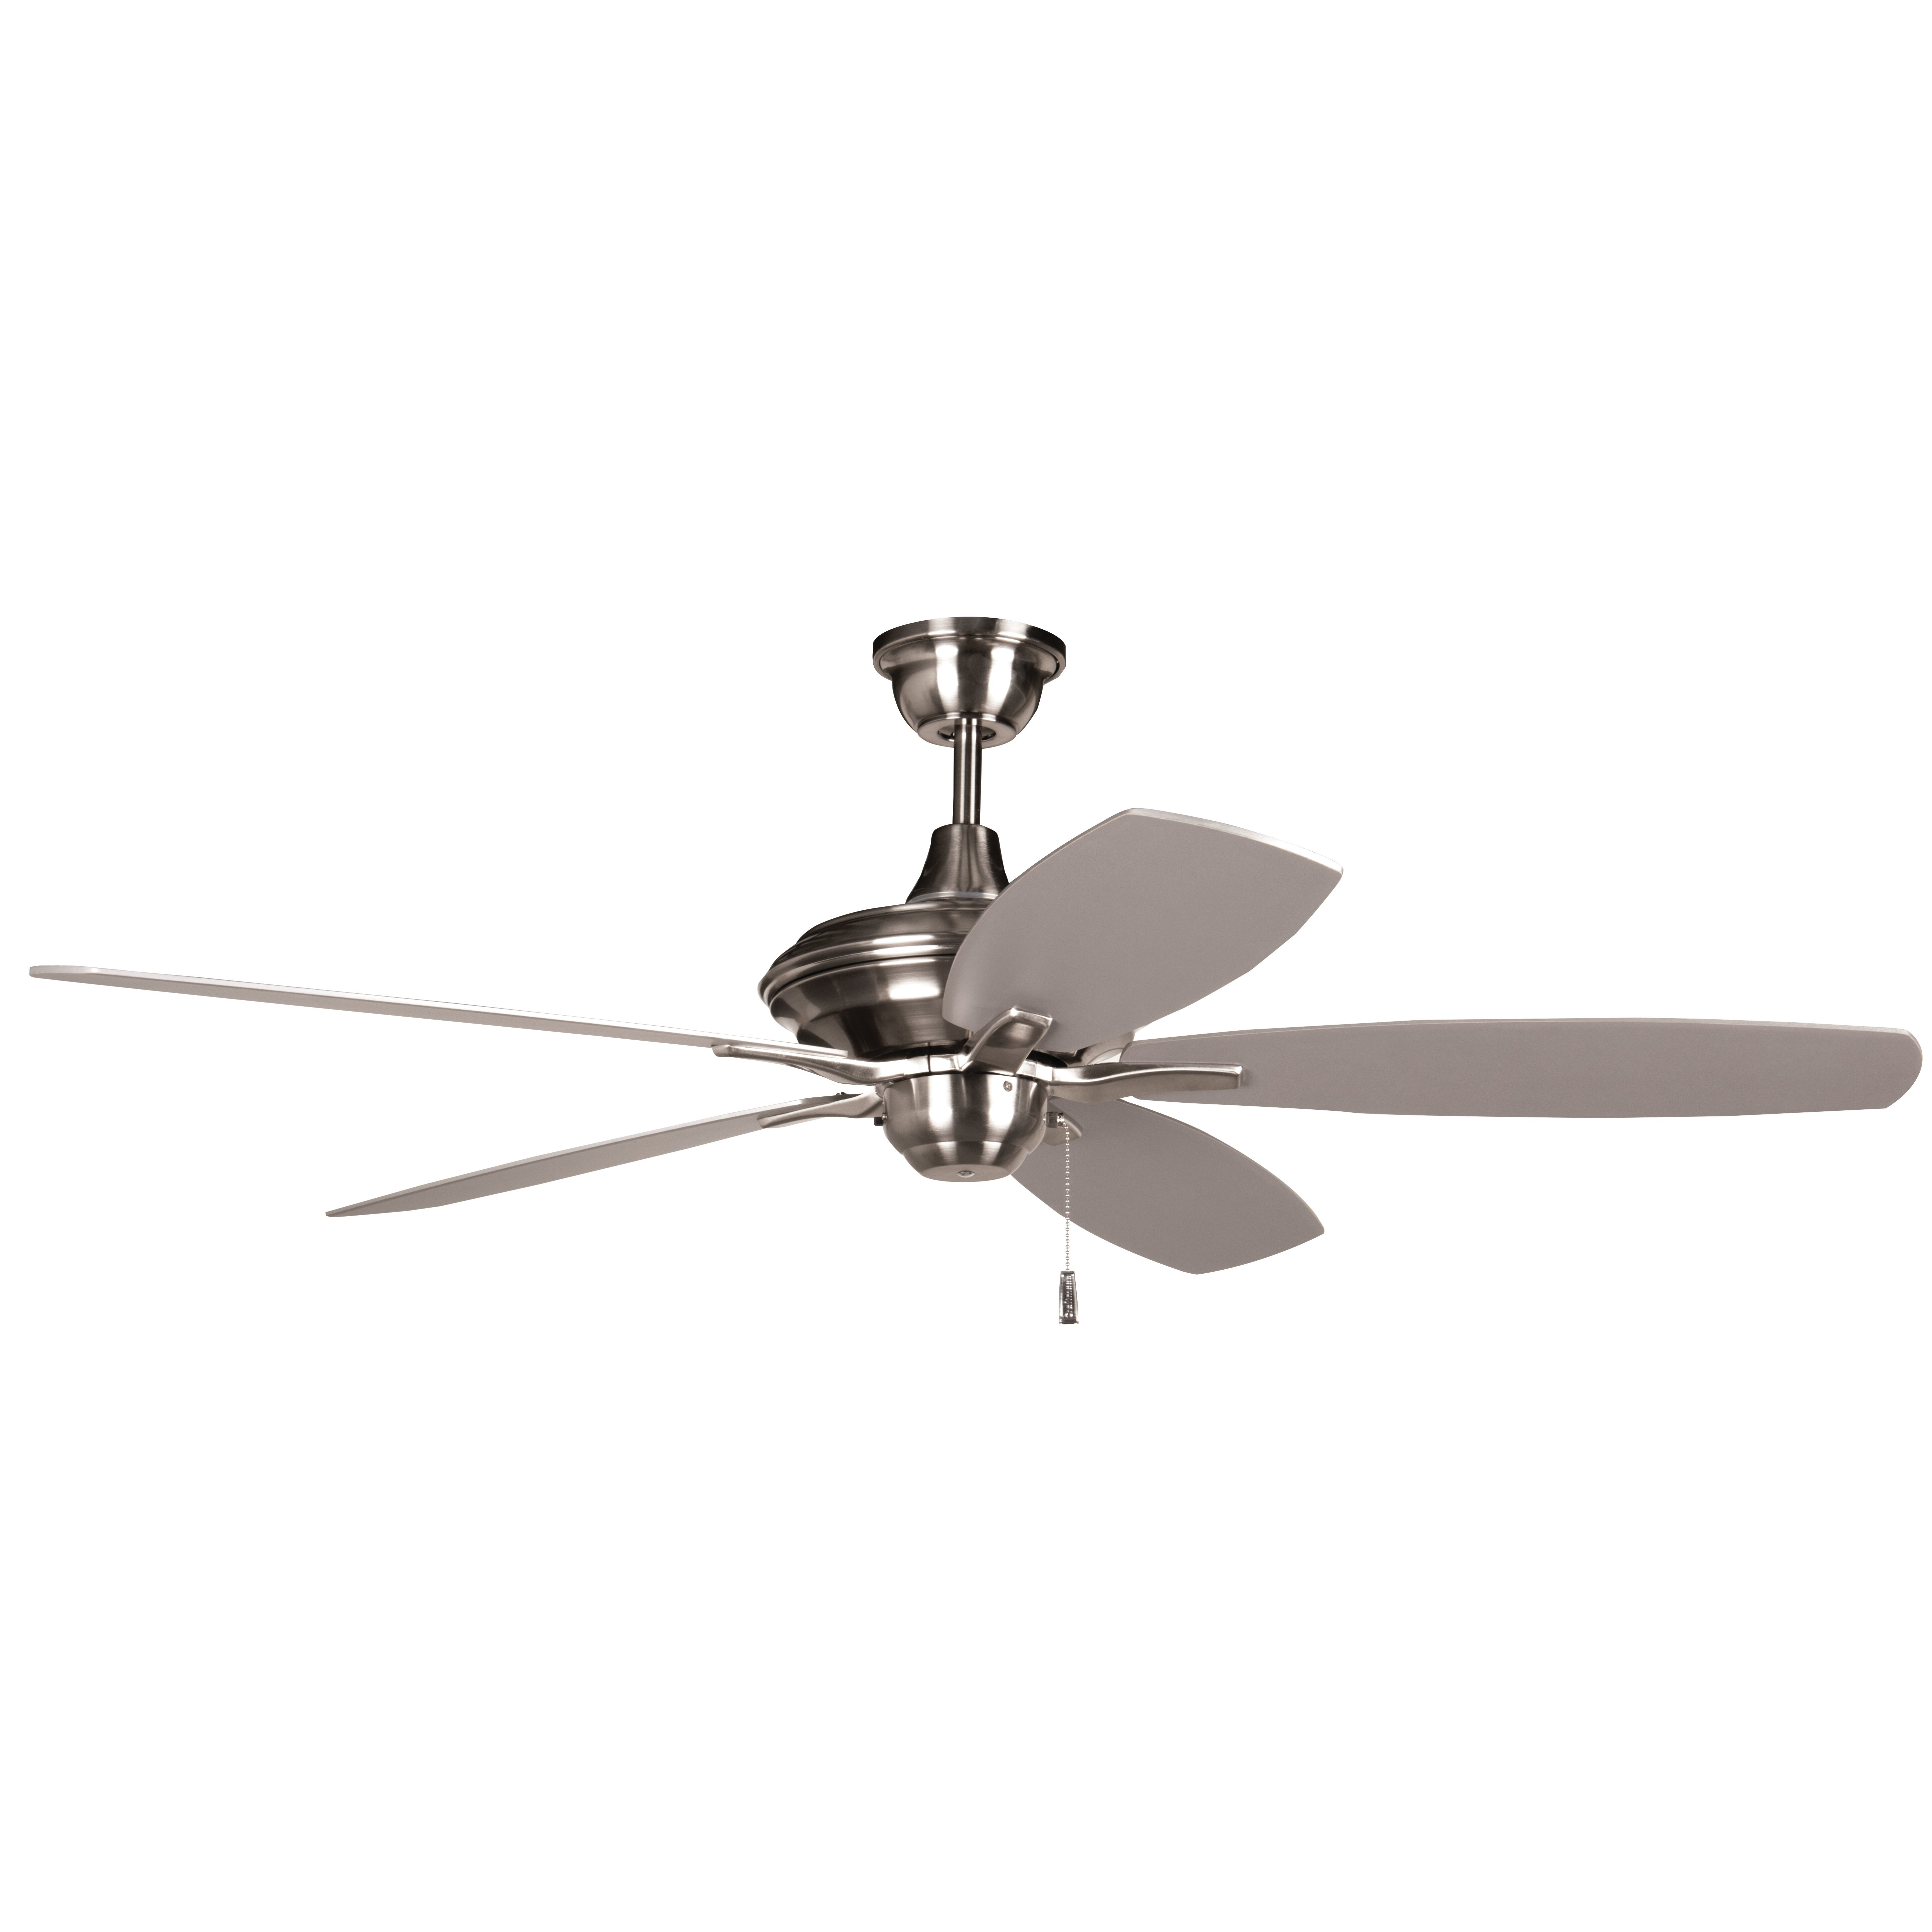 52 Copeland 5 Blade Ceiling Fan by Craftmade #38312B